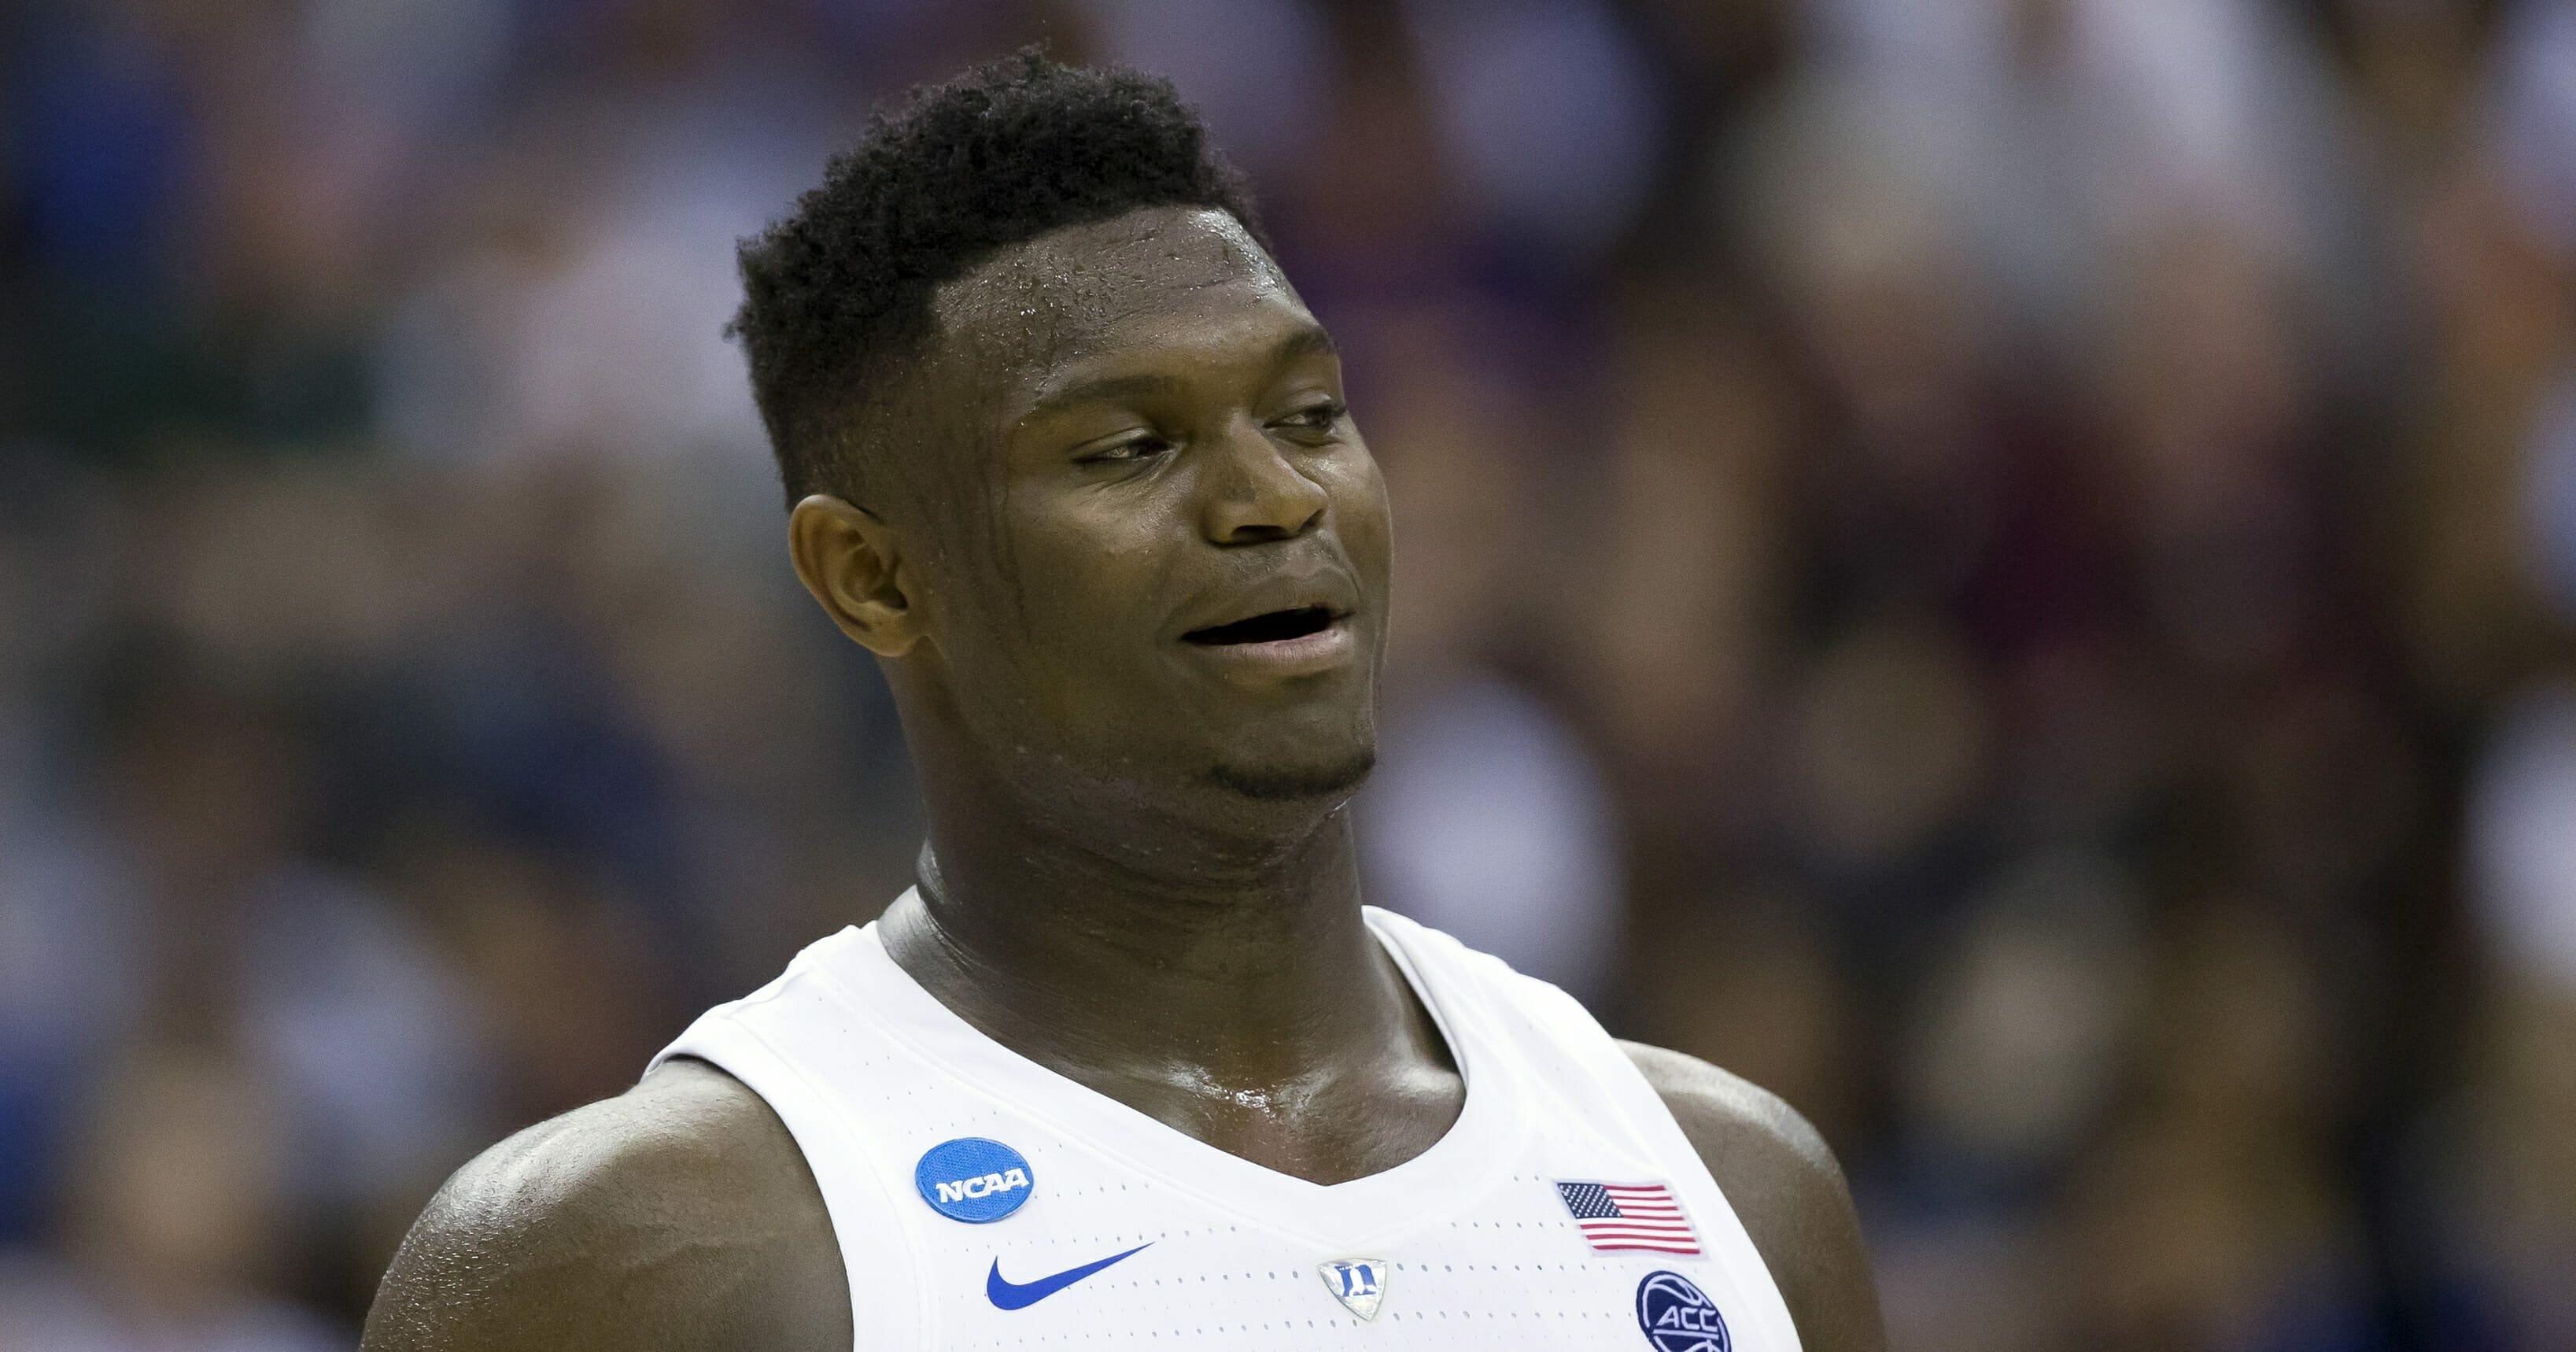 In this March 29, 2019, file photo, Duke forward Zion Williamson reacts during an East Regional semifinal in the NCAA men's basketball tournamenet against Virginia Tech in Washington.